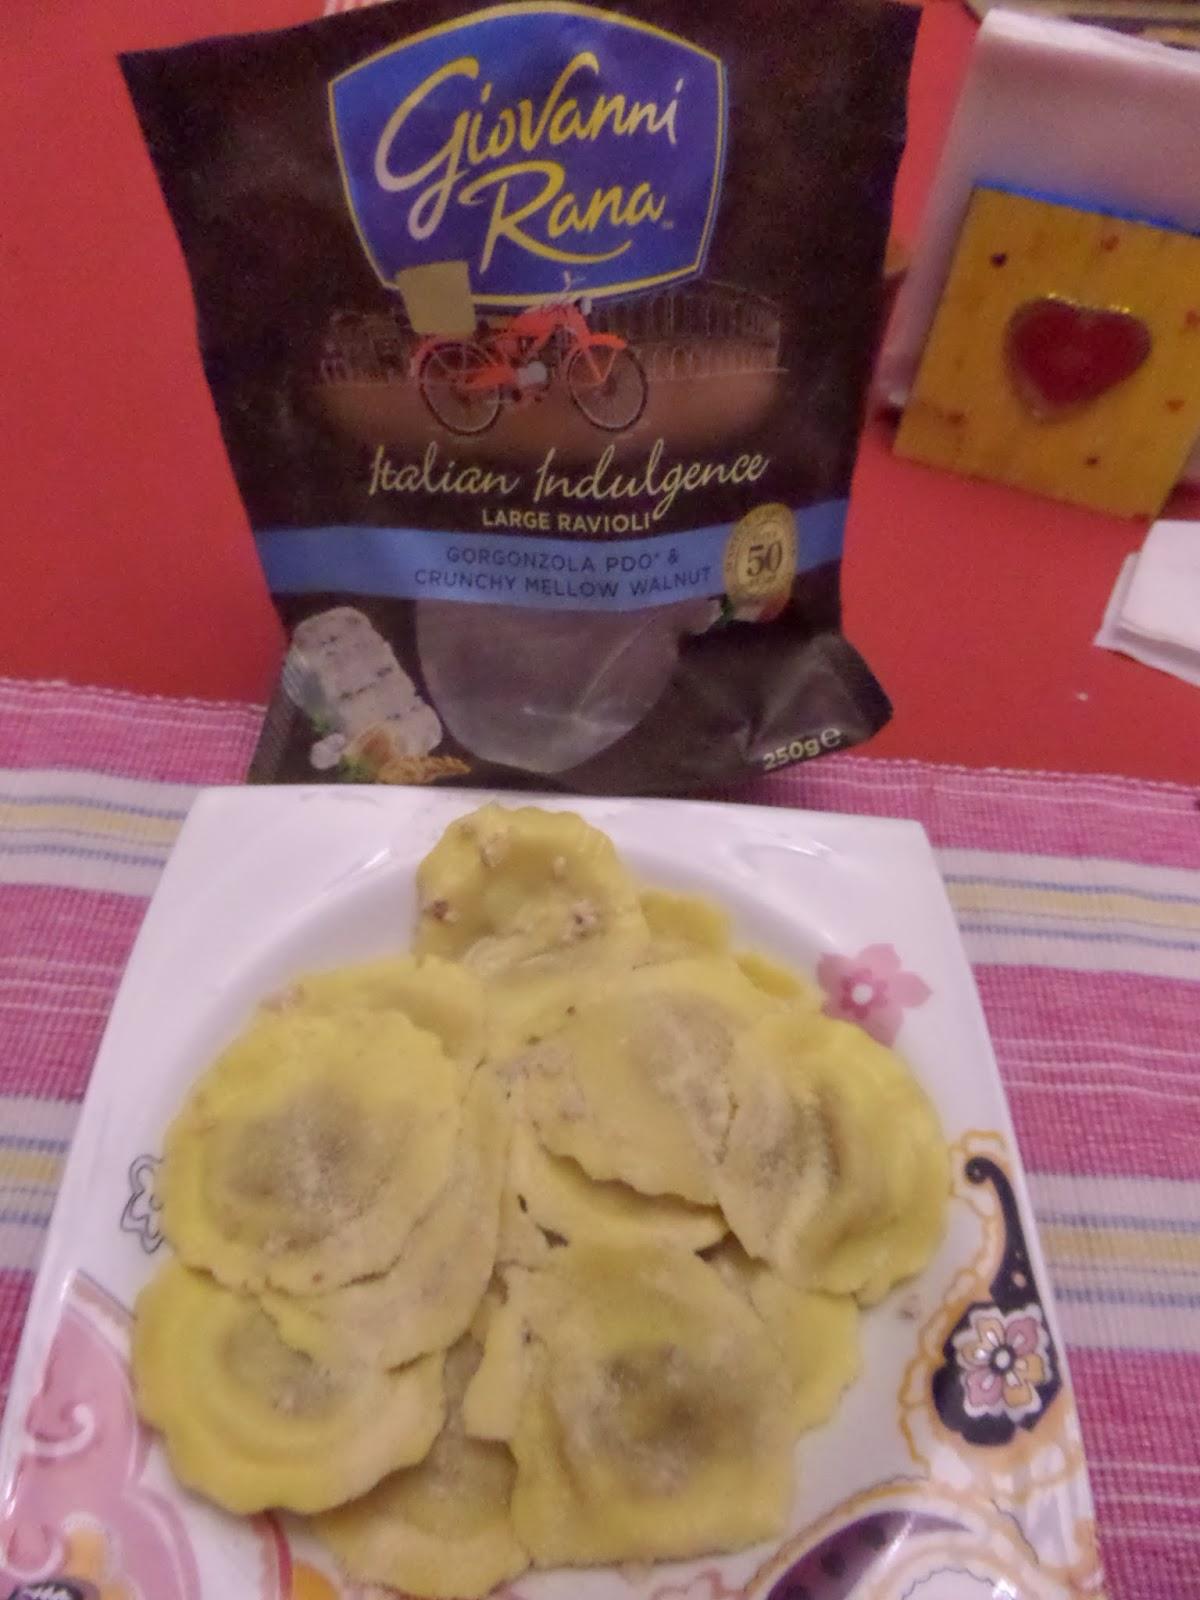 Madhouse Family Reviews Giovanni Rana fresh filled pasta